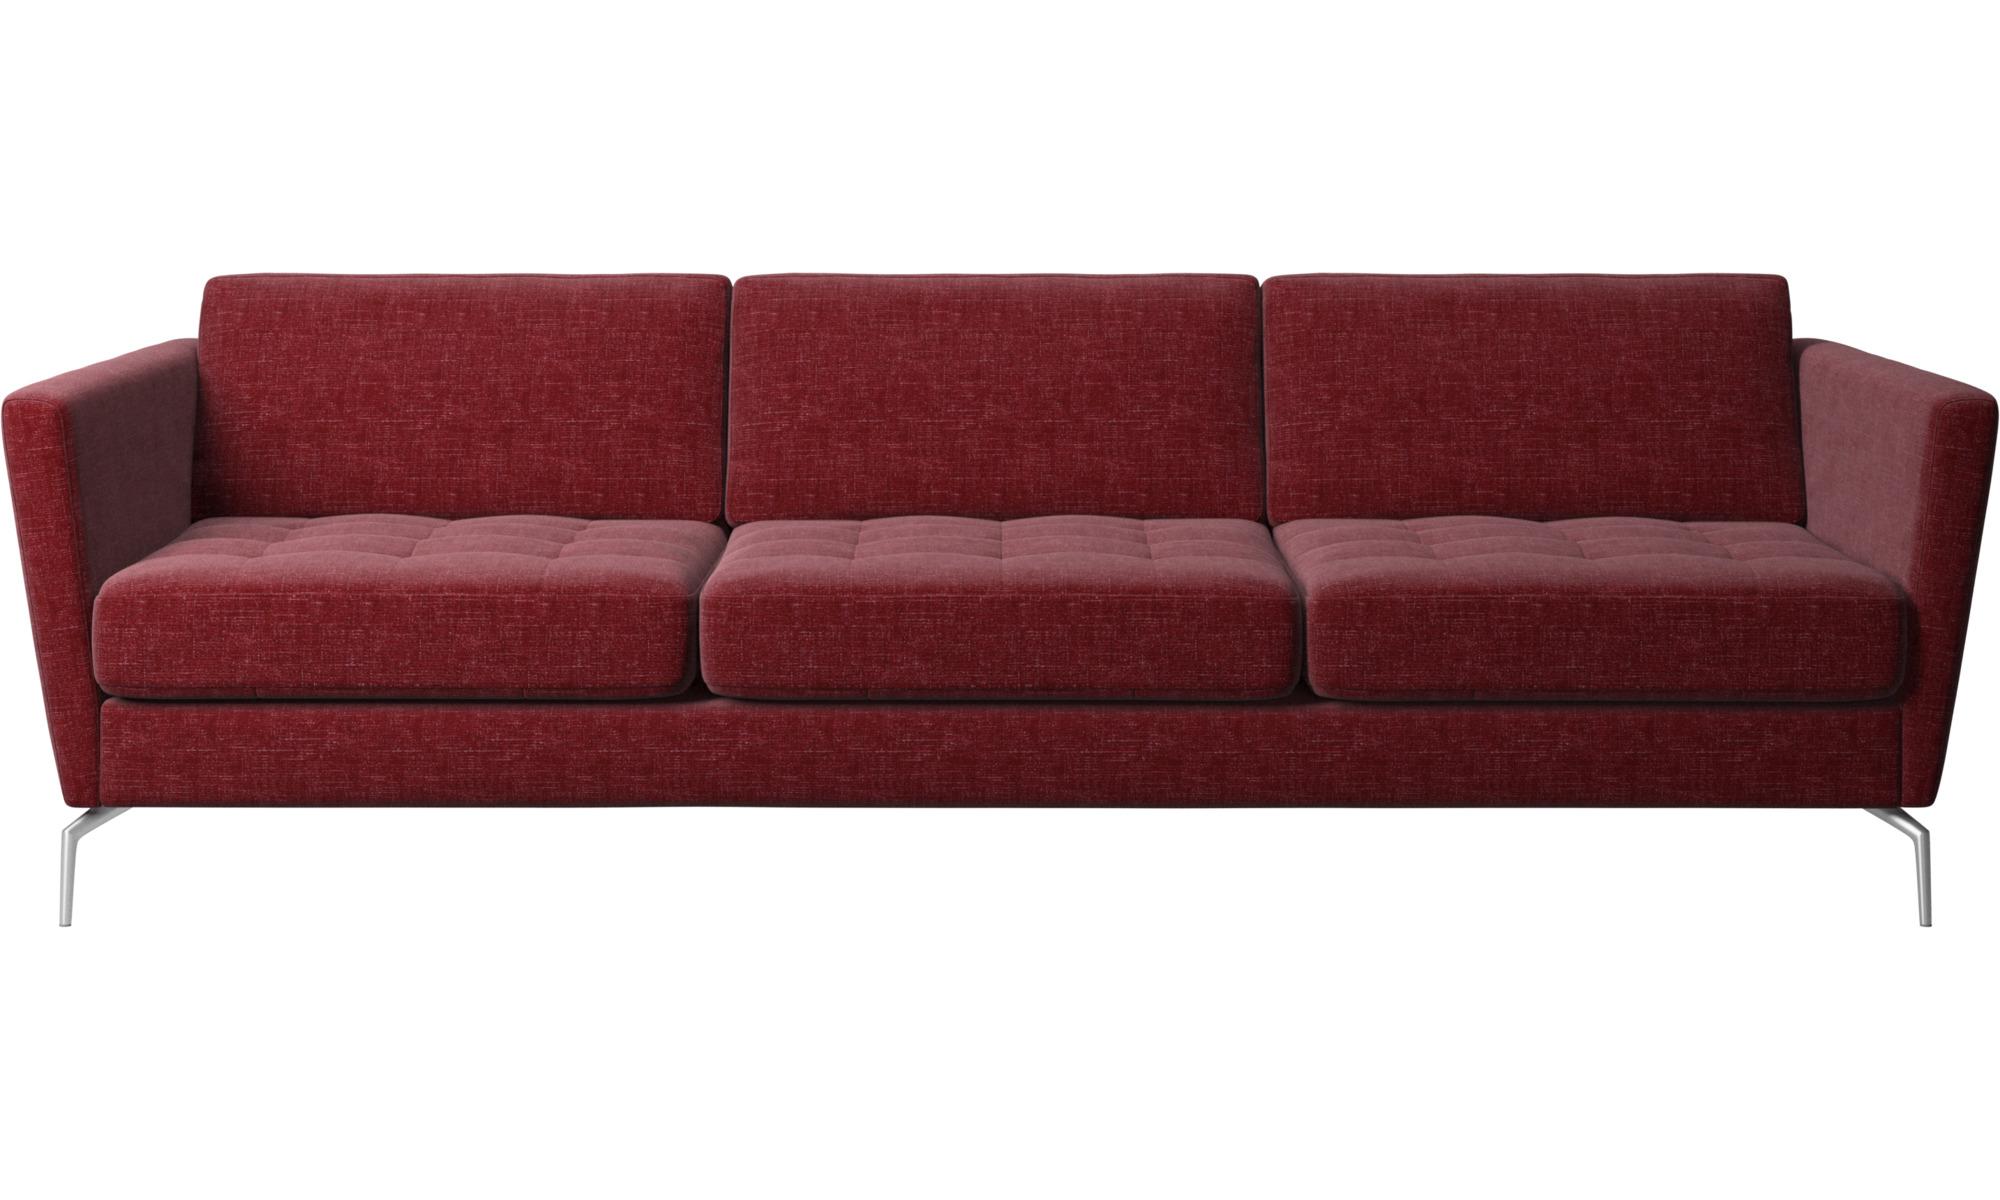 Fine 3 Seater Sofas Osaka Sofa Tufted Seat Boconcept Pdpeps Interior Chair Design Pdpepsorg